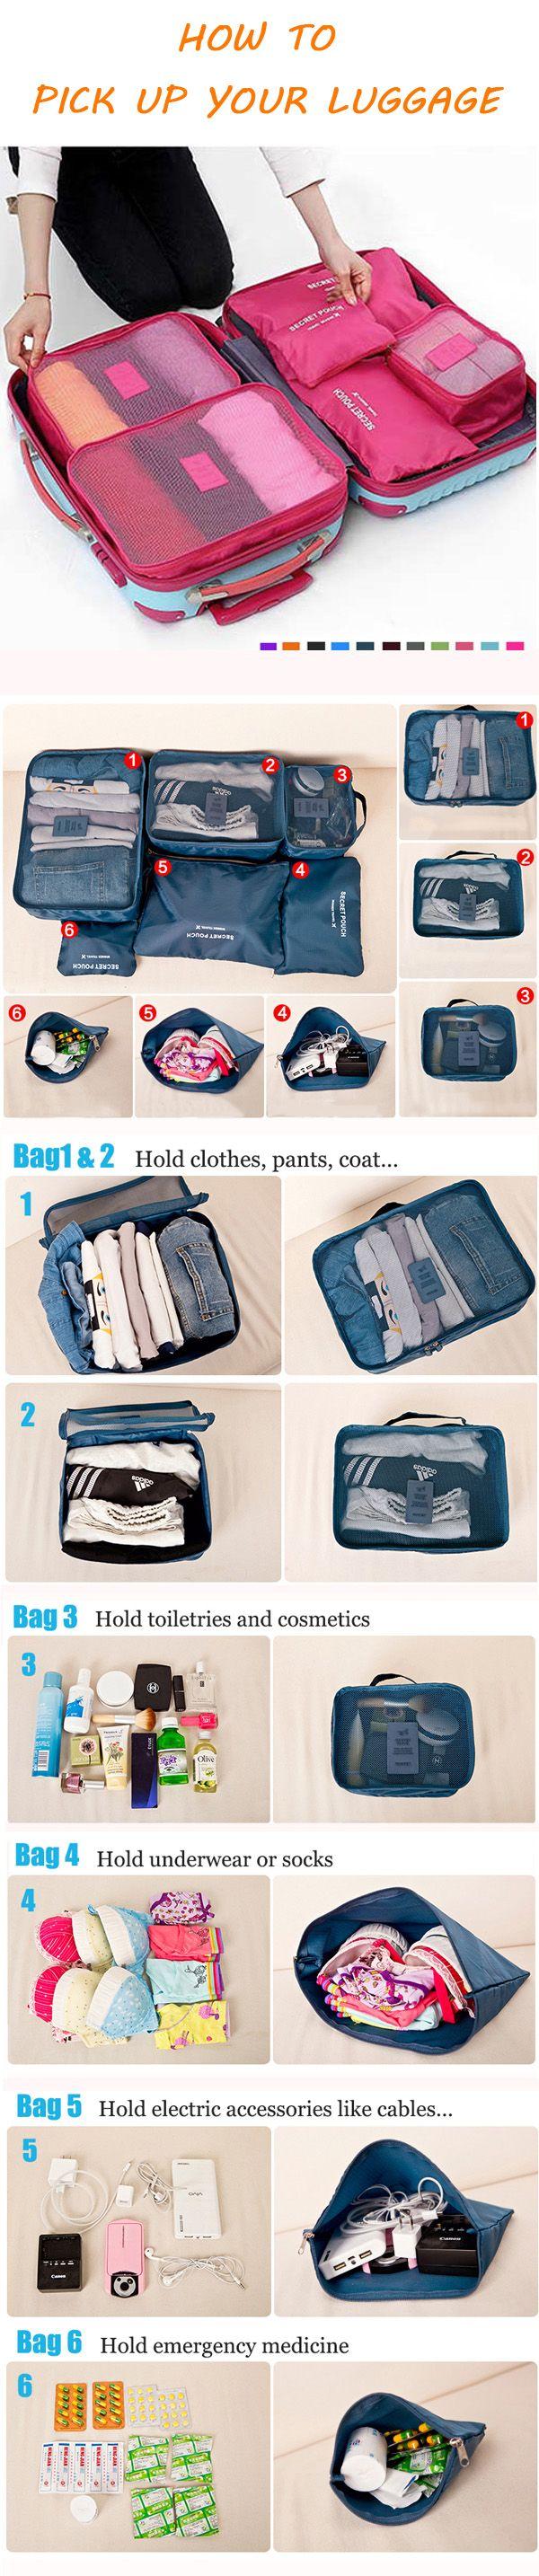 US 9.89  6Pcs Waterproof Cube Travel Storage Bags Clothes Pouch Nylon  Luggage Organizer Travel 845b37e318